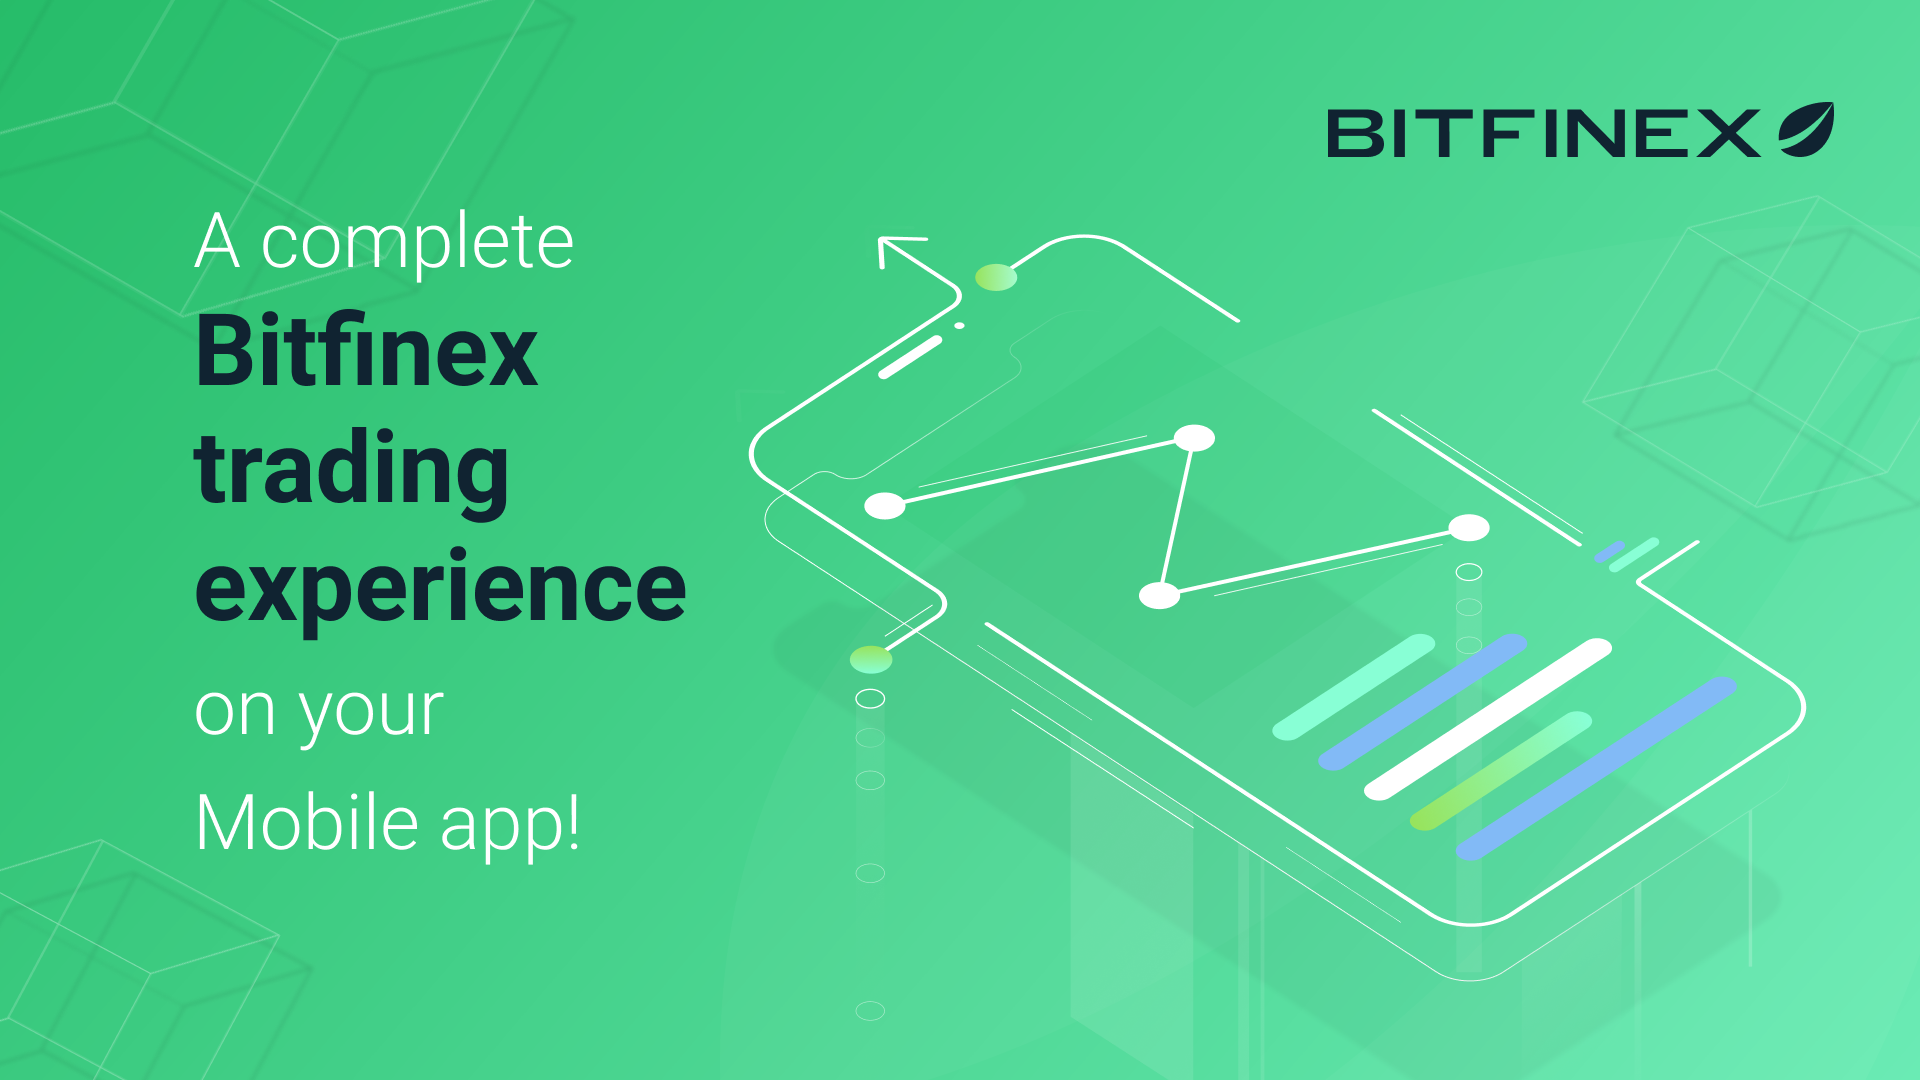 Mobile App Change Log 3.46.0